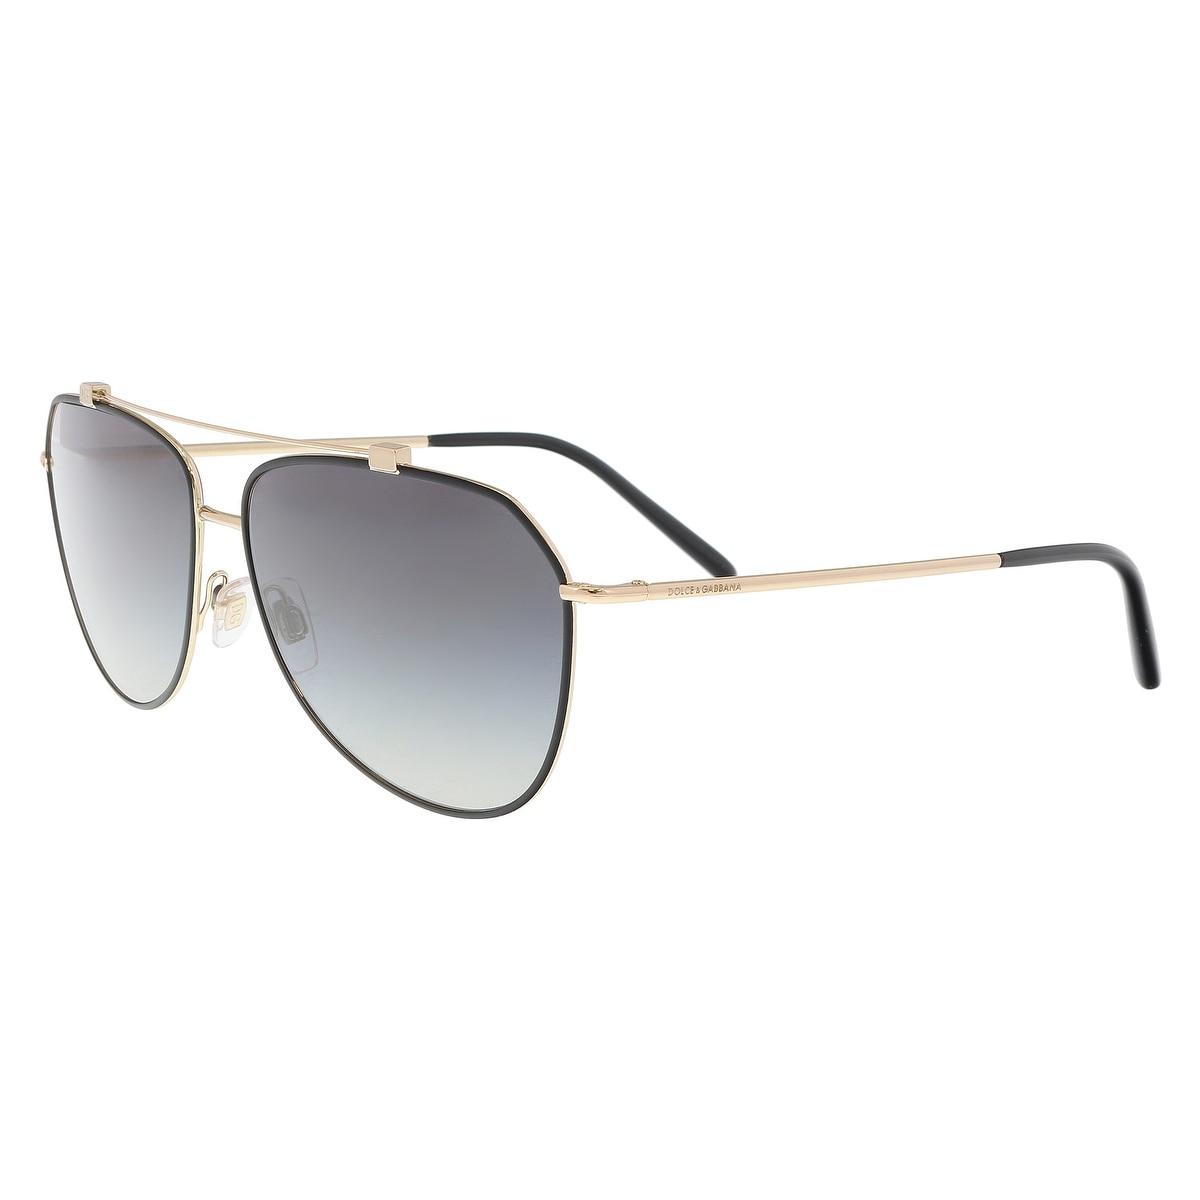 57776513c9 Dolce   Gabbana DG2190 12968G Matte Black Aviator Sunglasses - 59-13-140